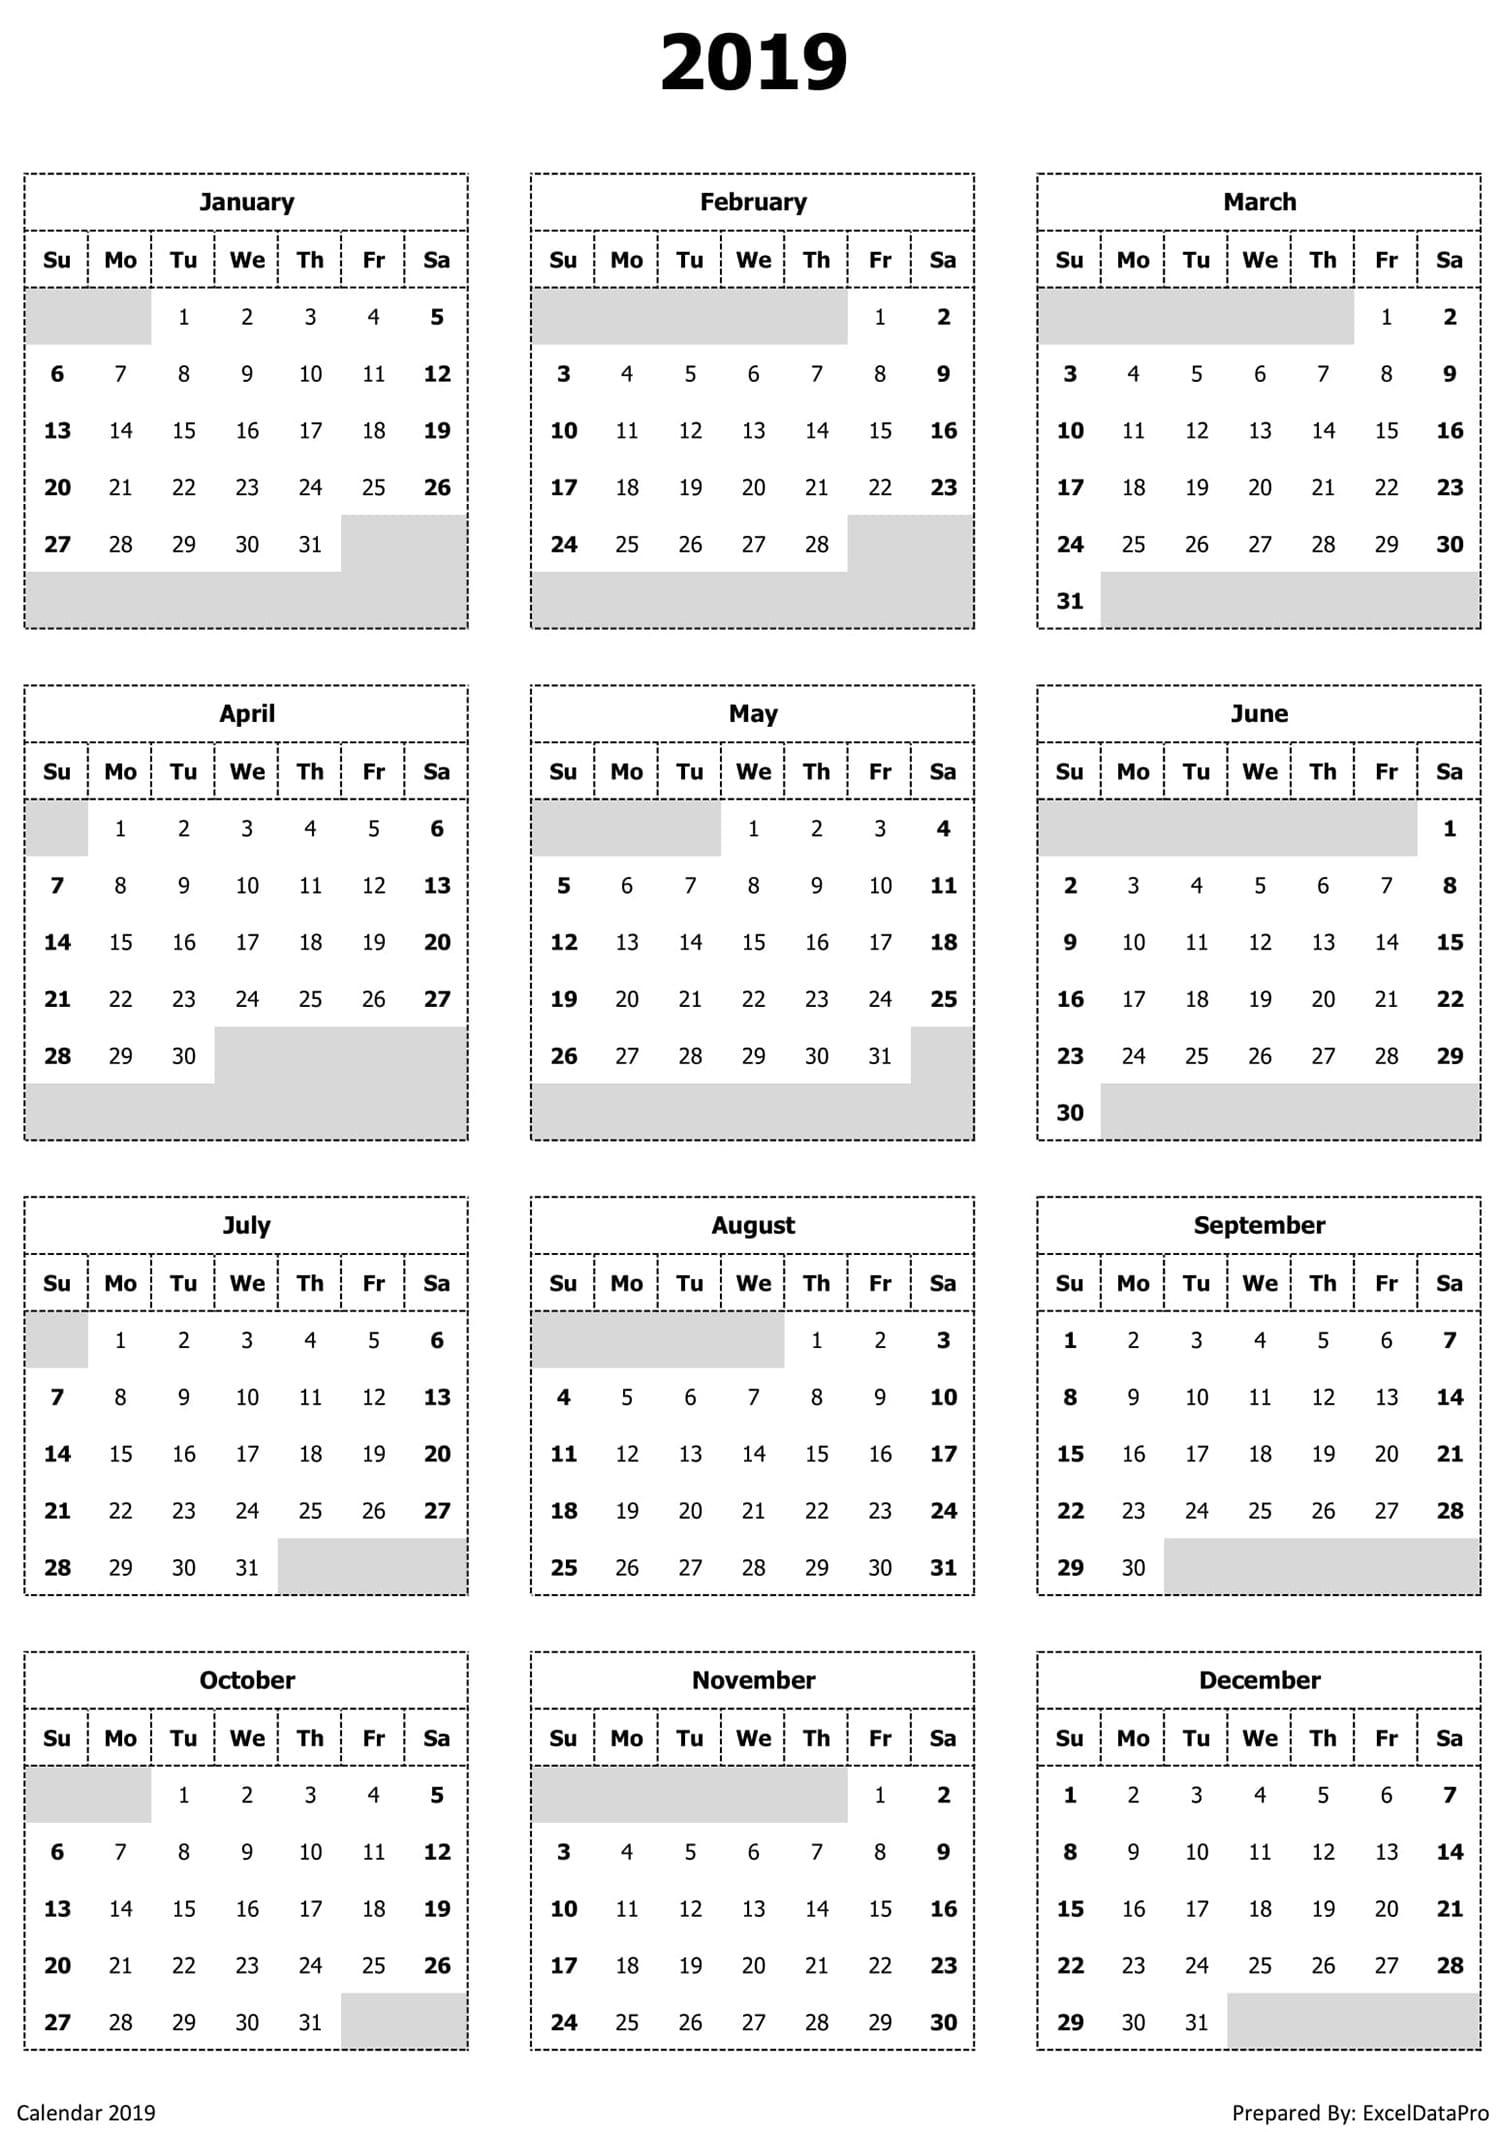 2019 Calendar Excel Templates Printable Pdfs Images Exceldatapro